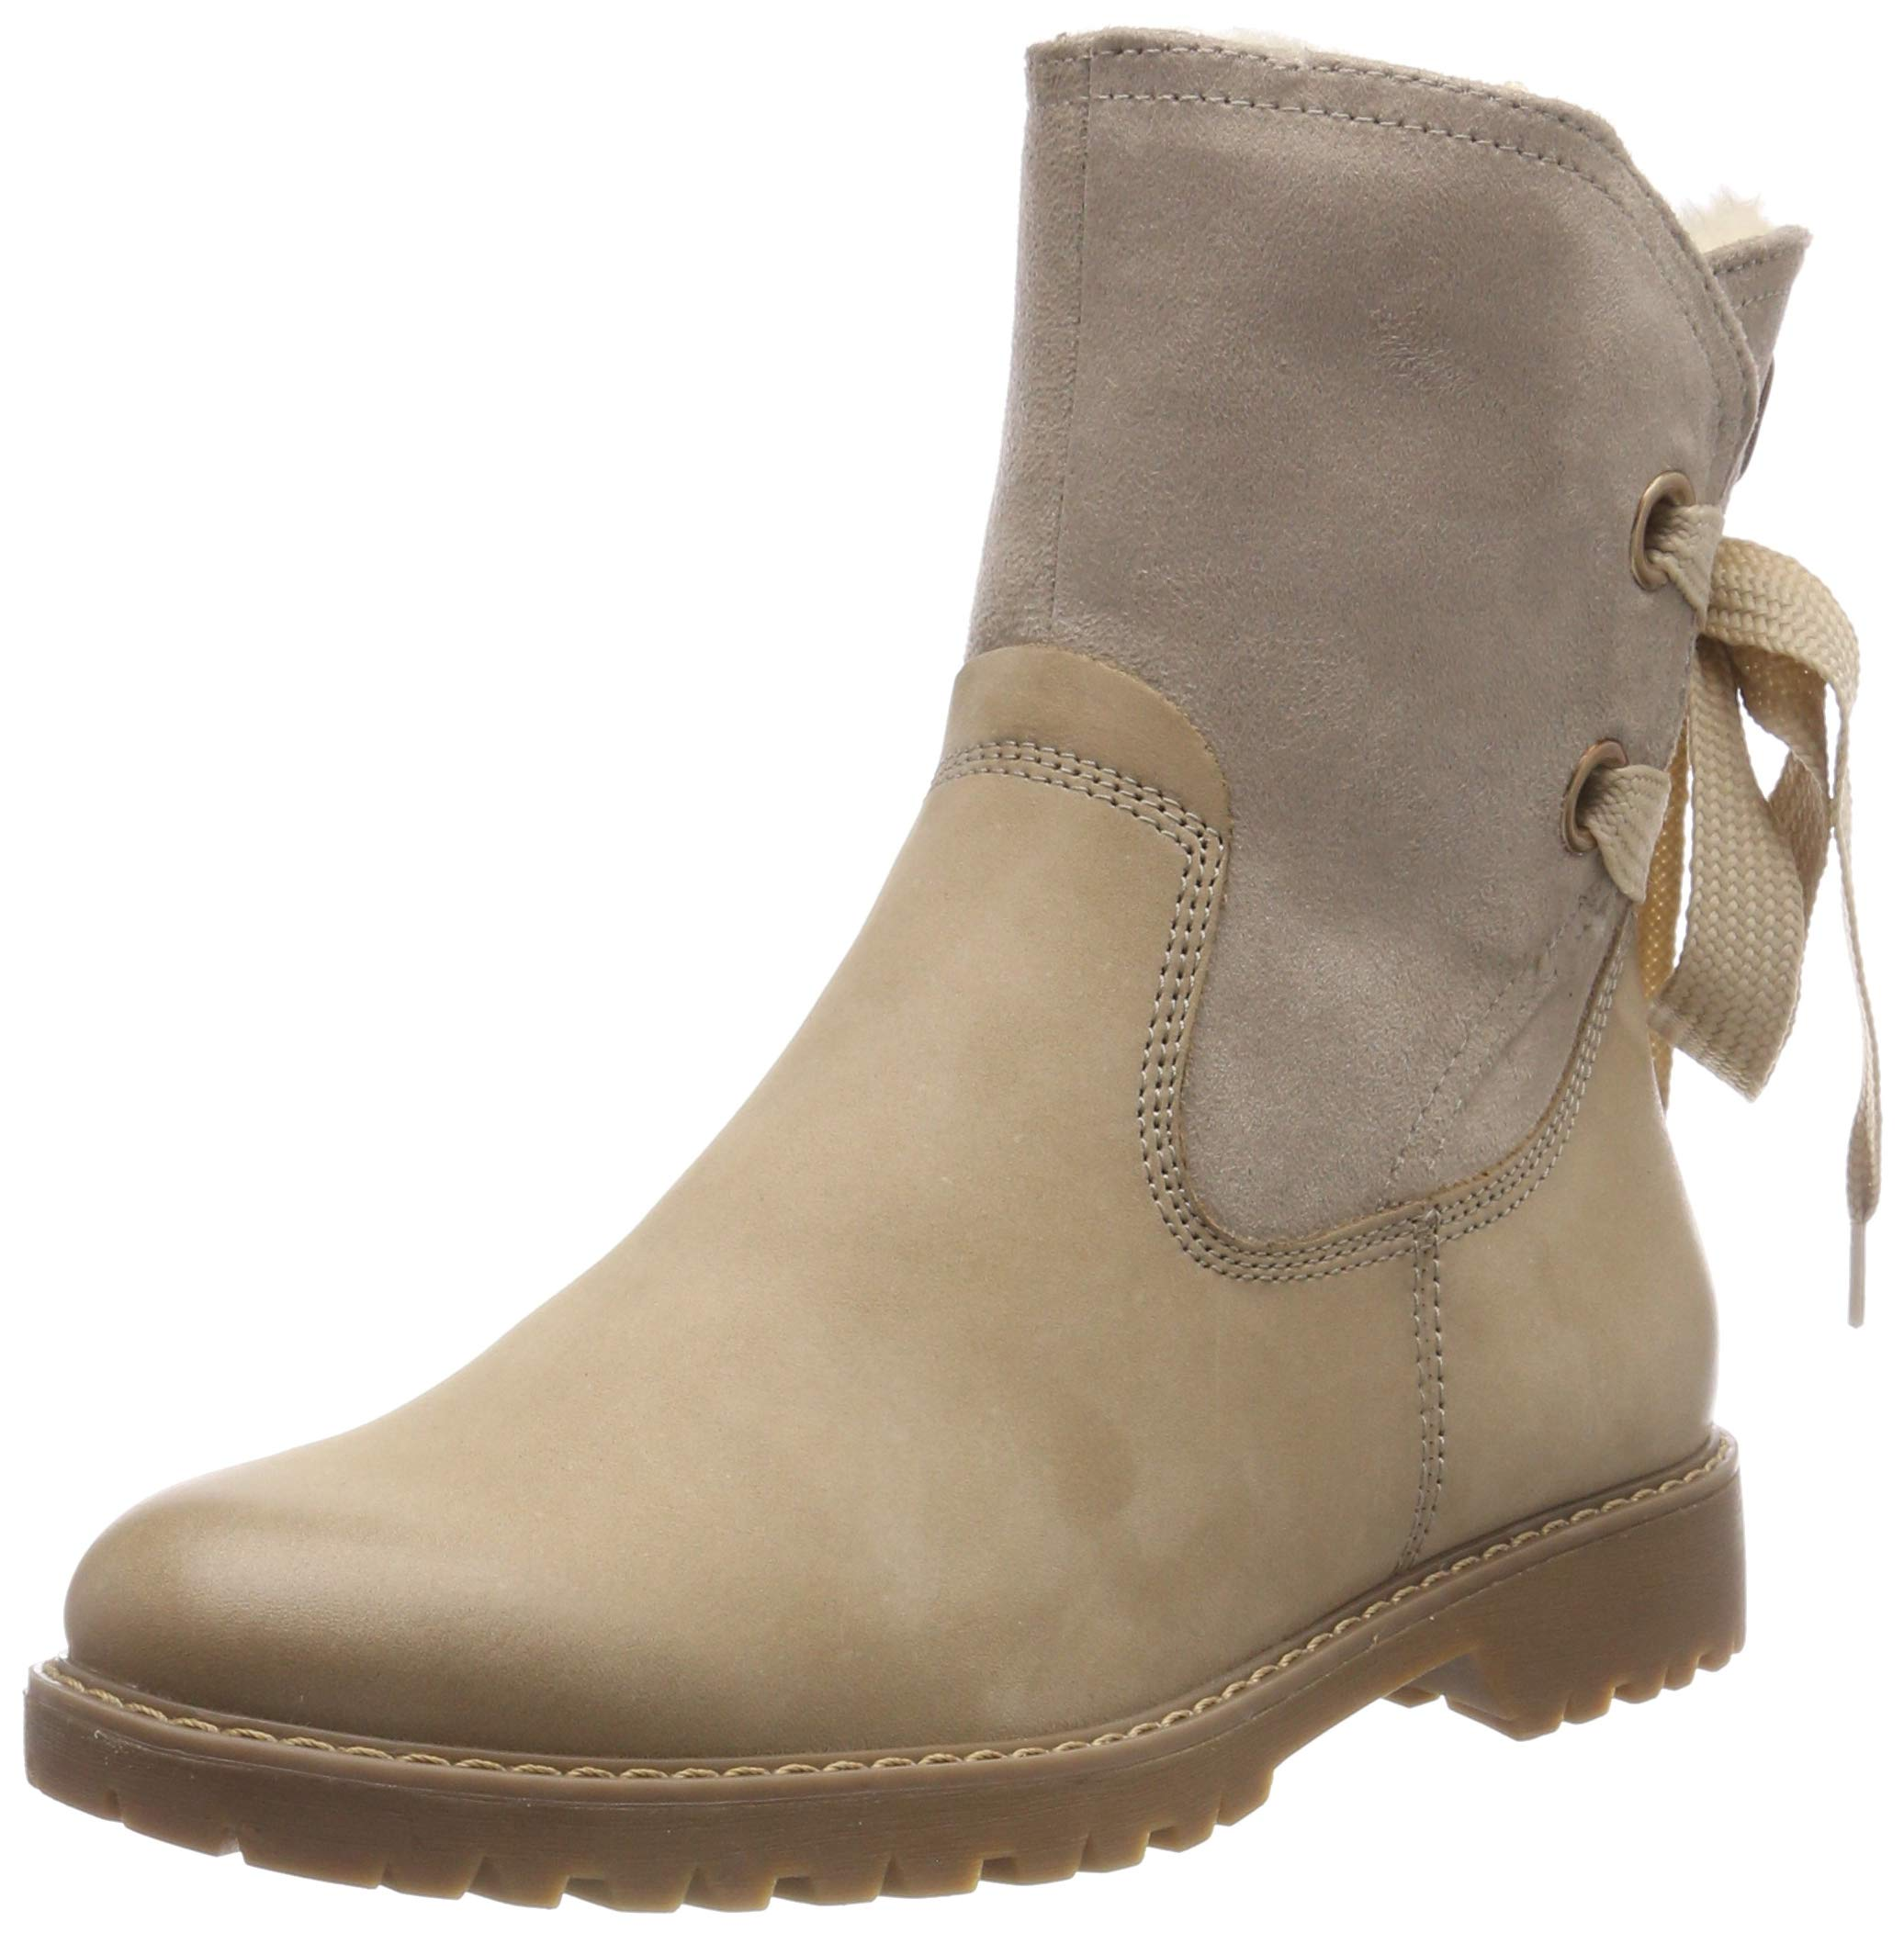 Tamaris® Stiefel in Braun: ab 35,97 € | Stylight